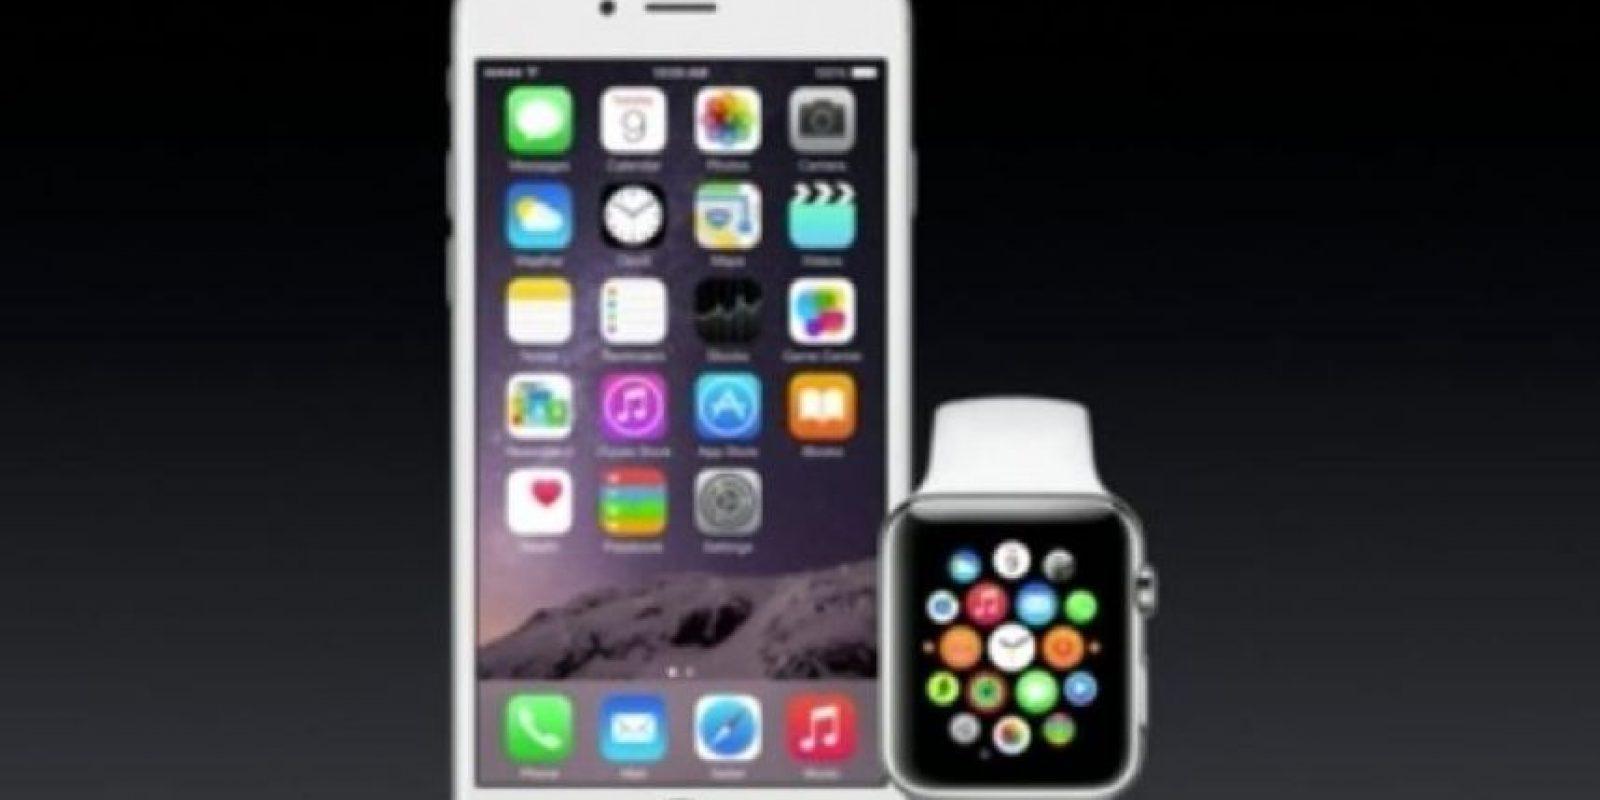 Para funcionar correctamente se debe conectar con un iPhone. Foto:Apple